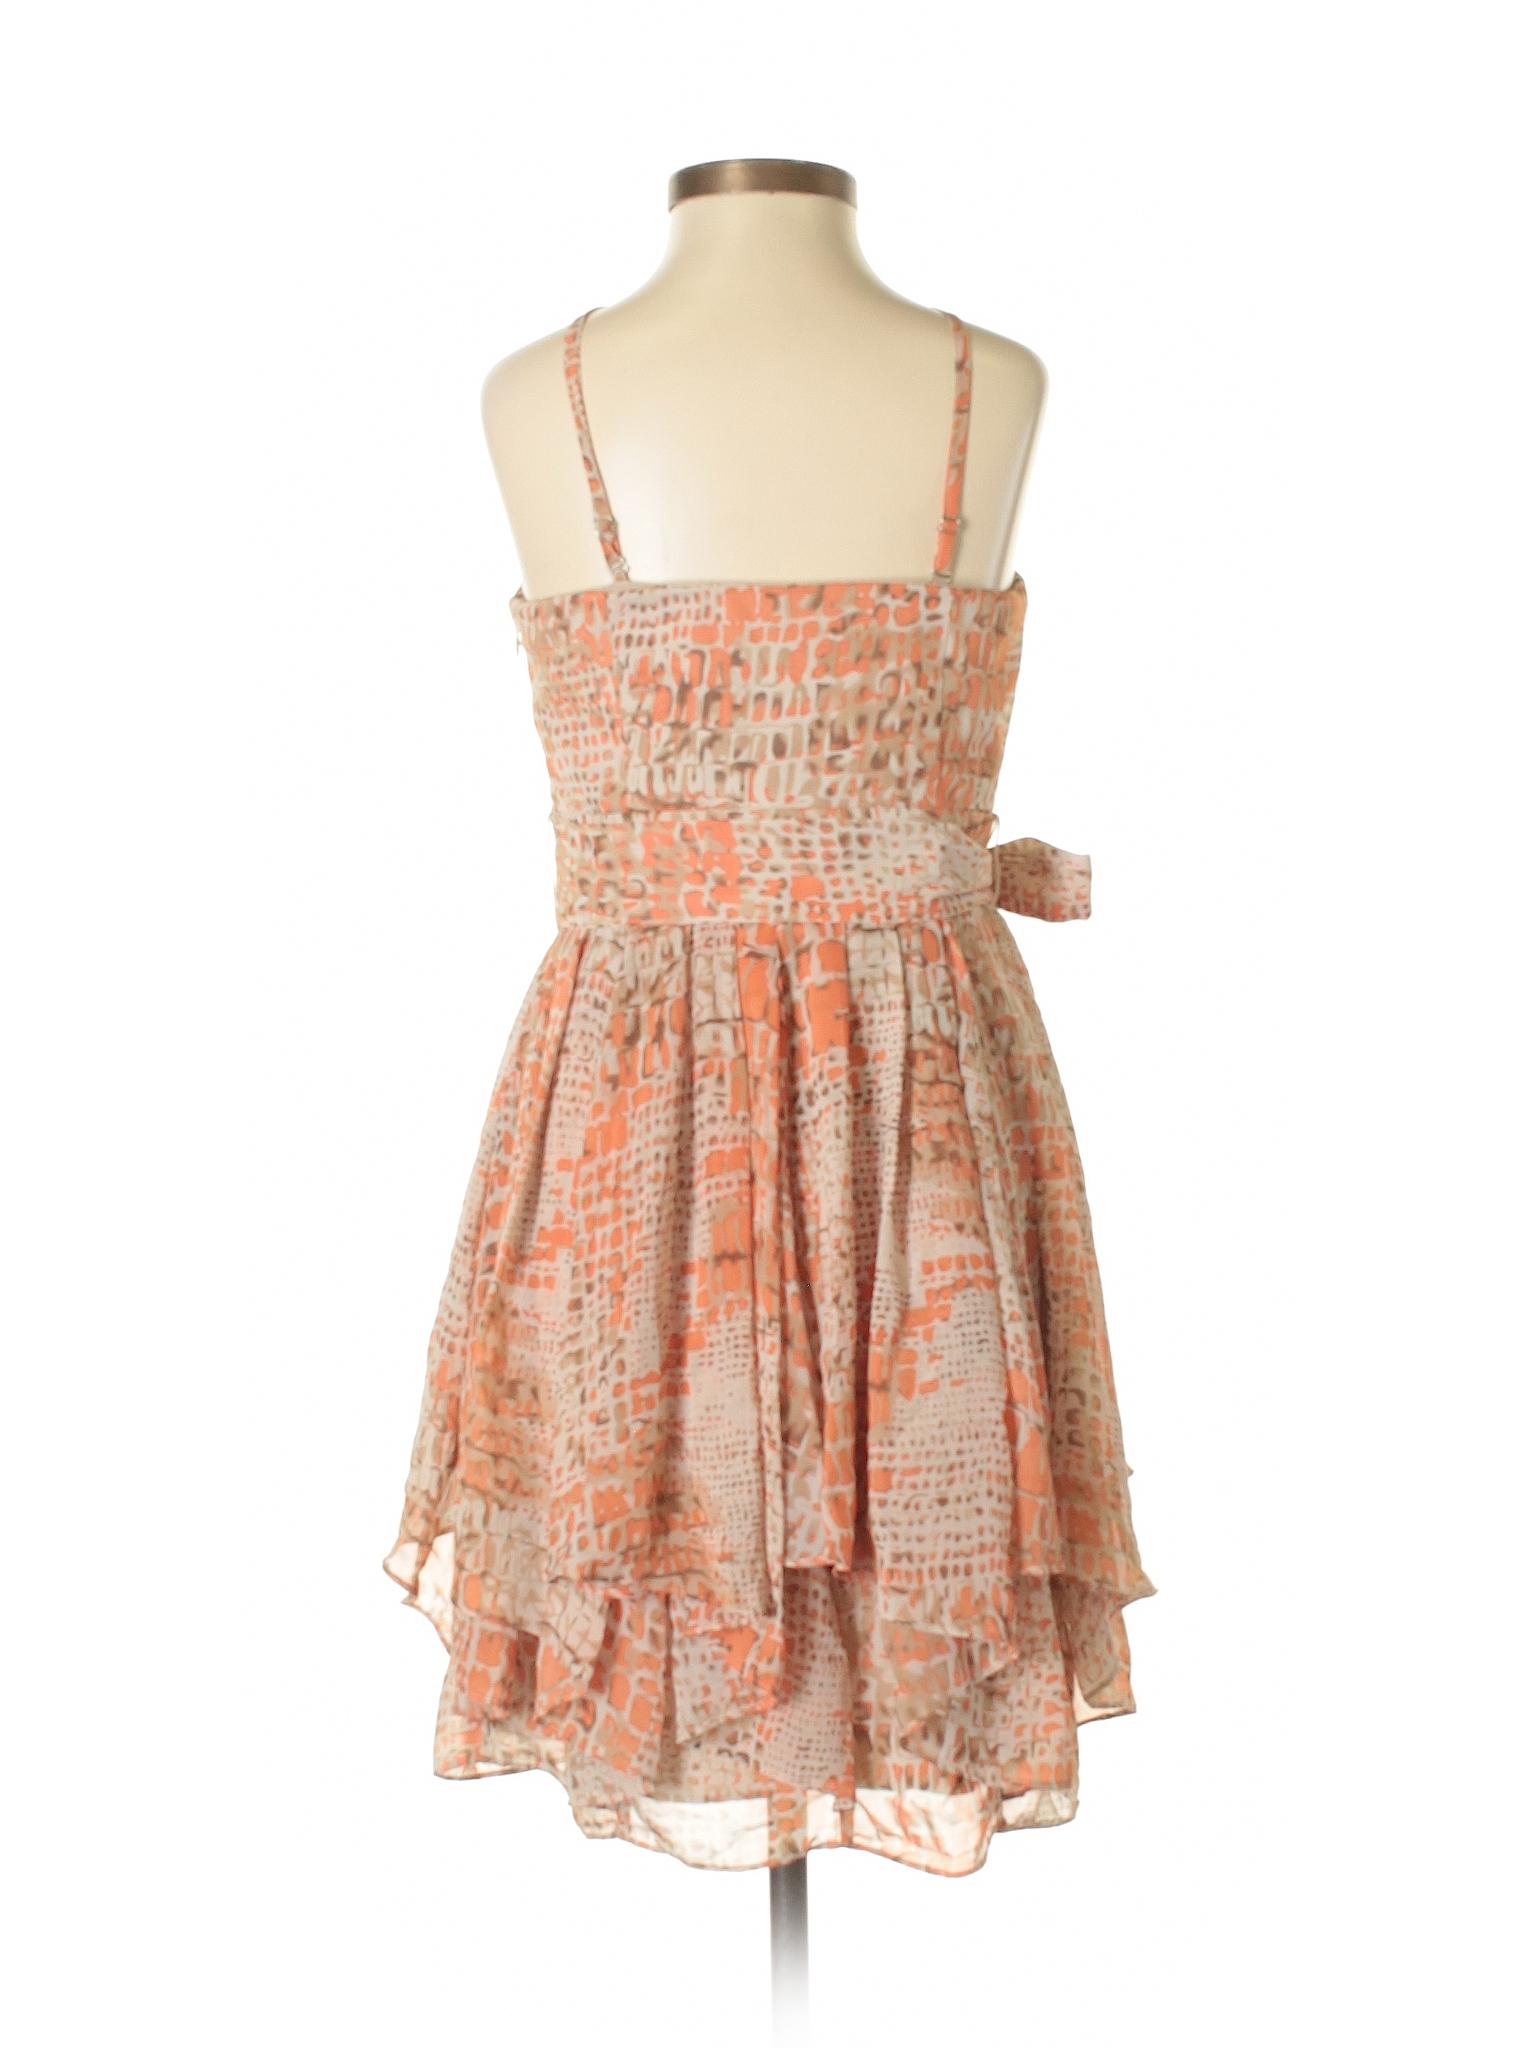 Casual Ark Dress amp; Co Boutique winter x7UqHwI5